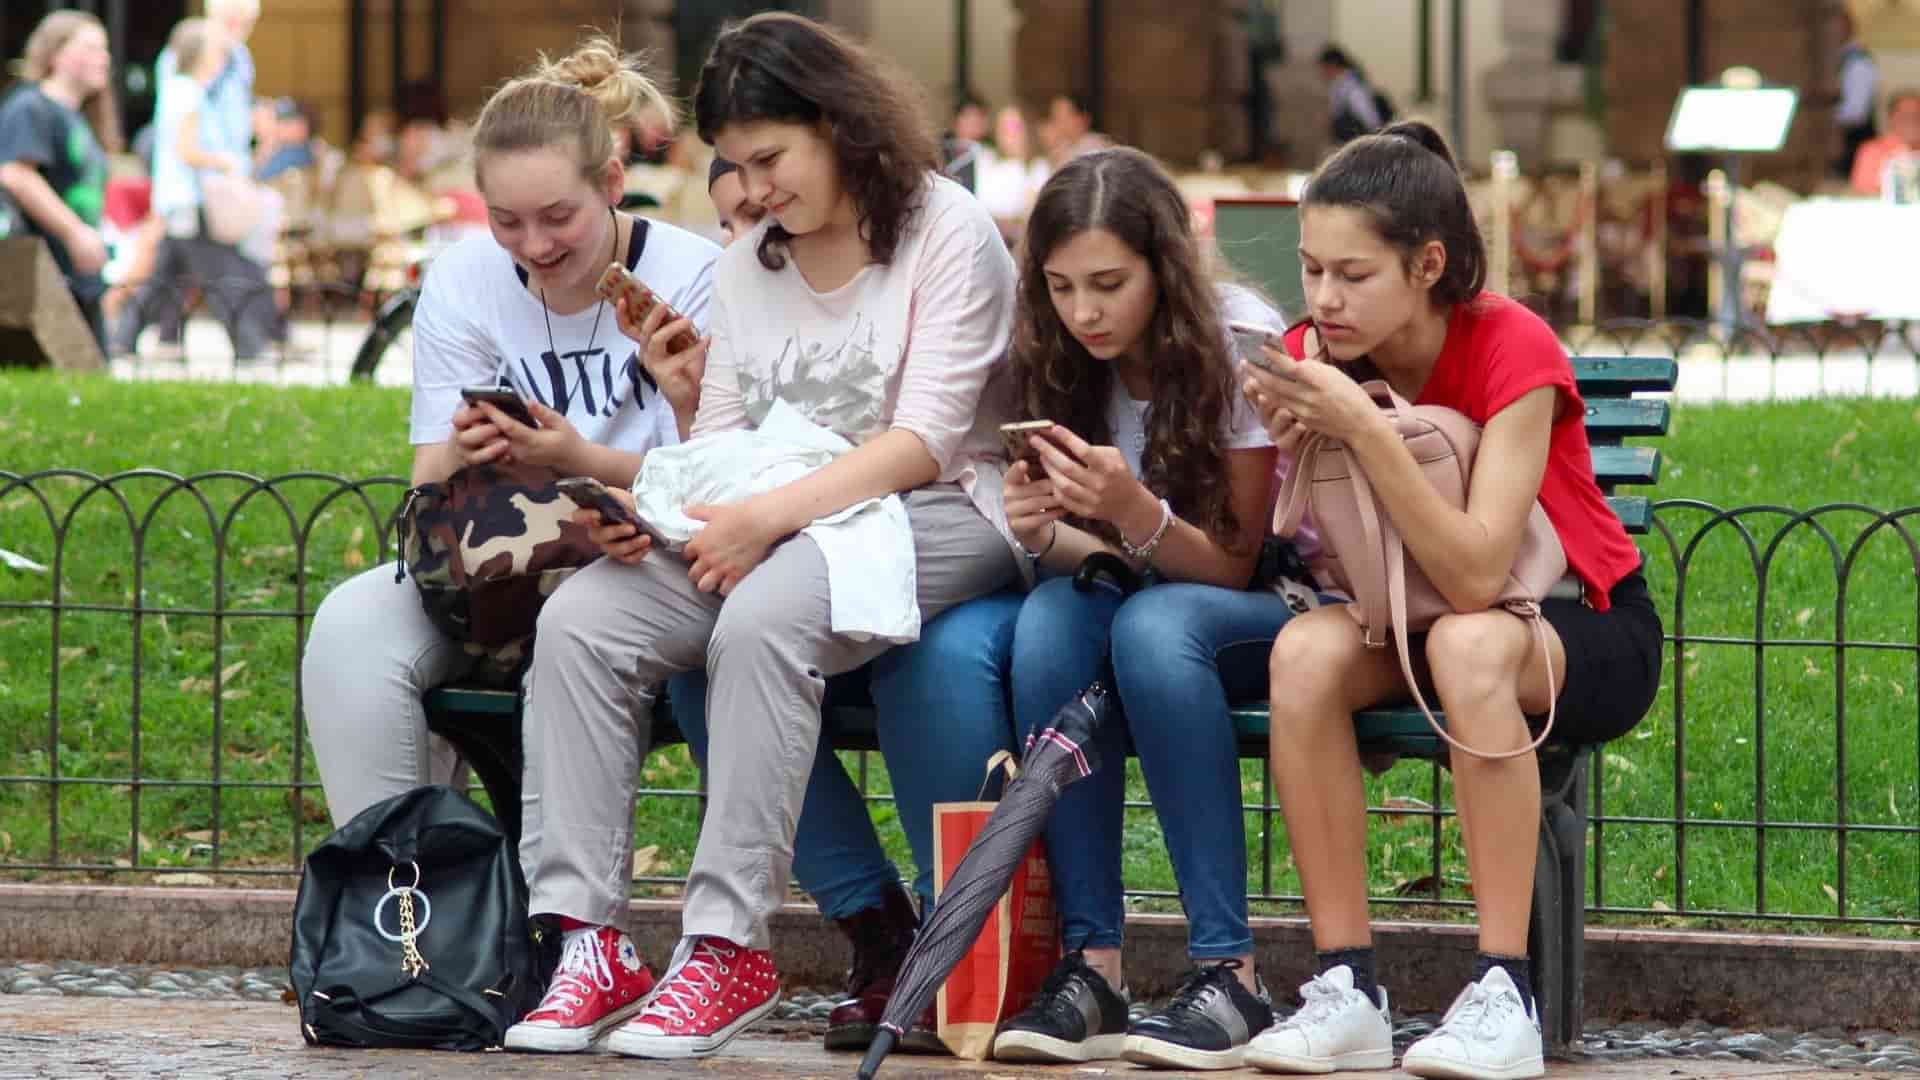 girls cell phones sitting